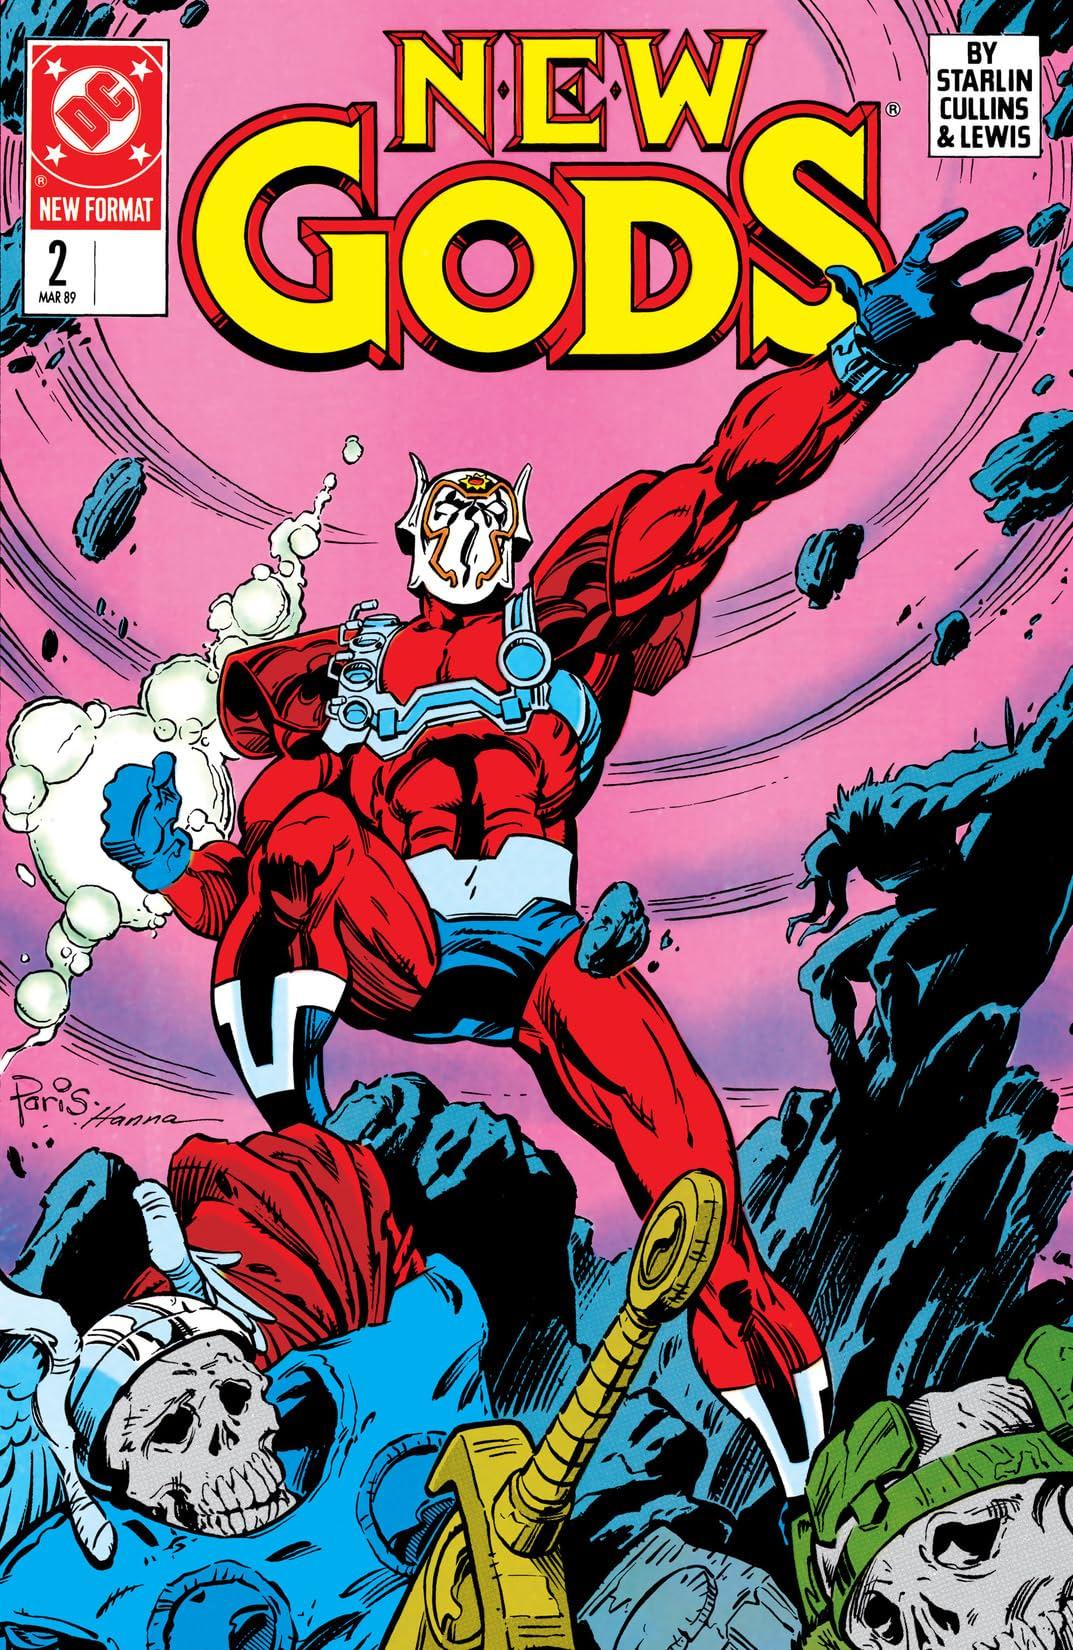 New Gods (1989-1991) #2